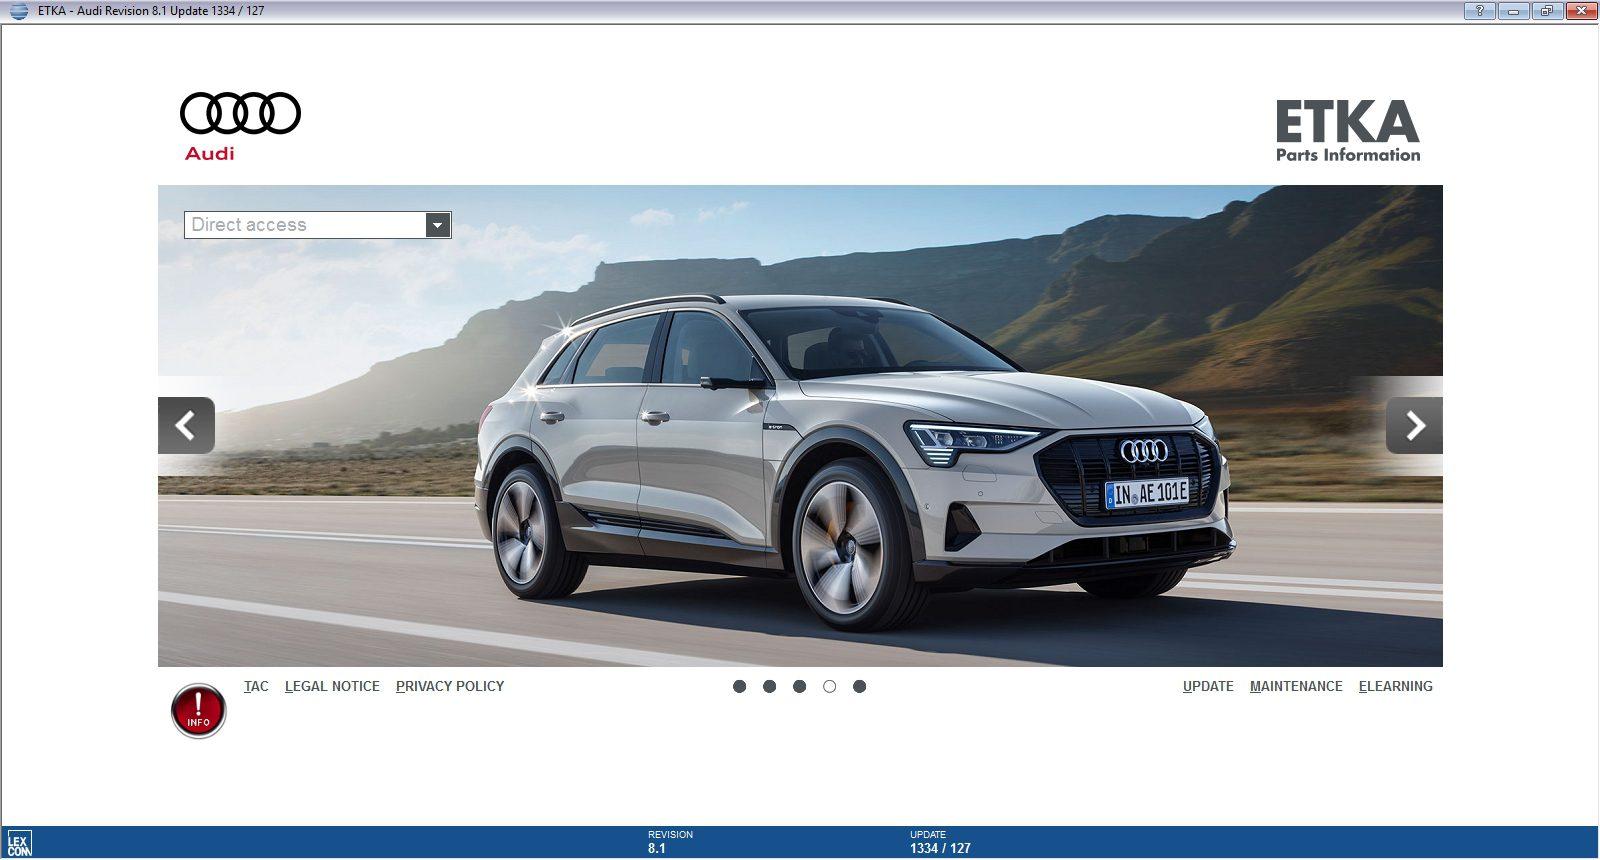 FAI AutoParts taxe kettensatz tck208l Pour Audi Seat Skoda VW